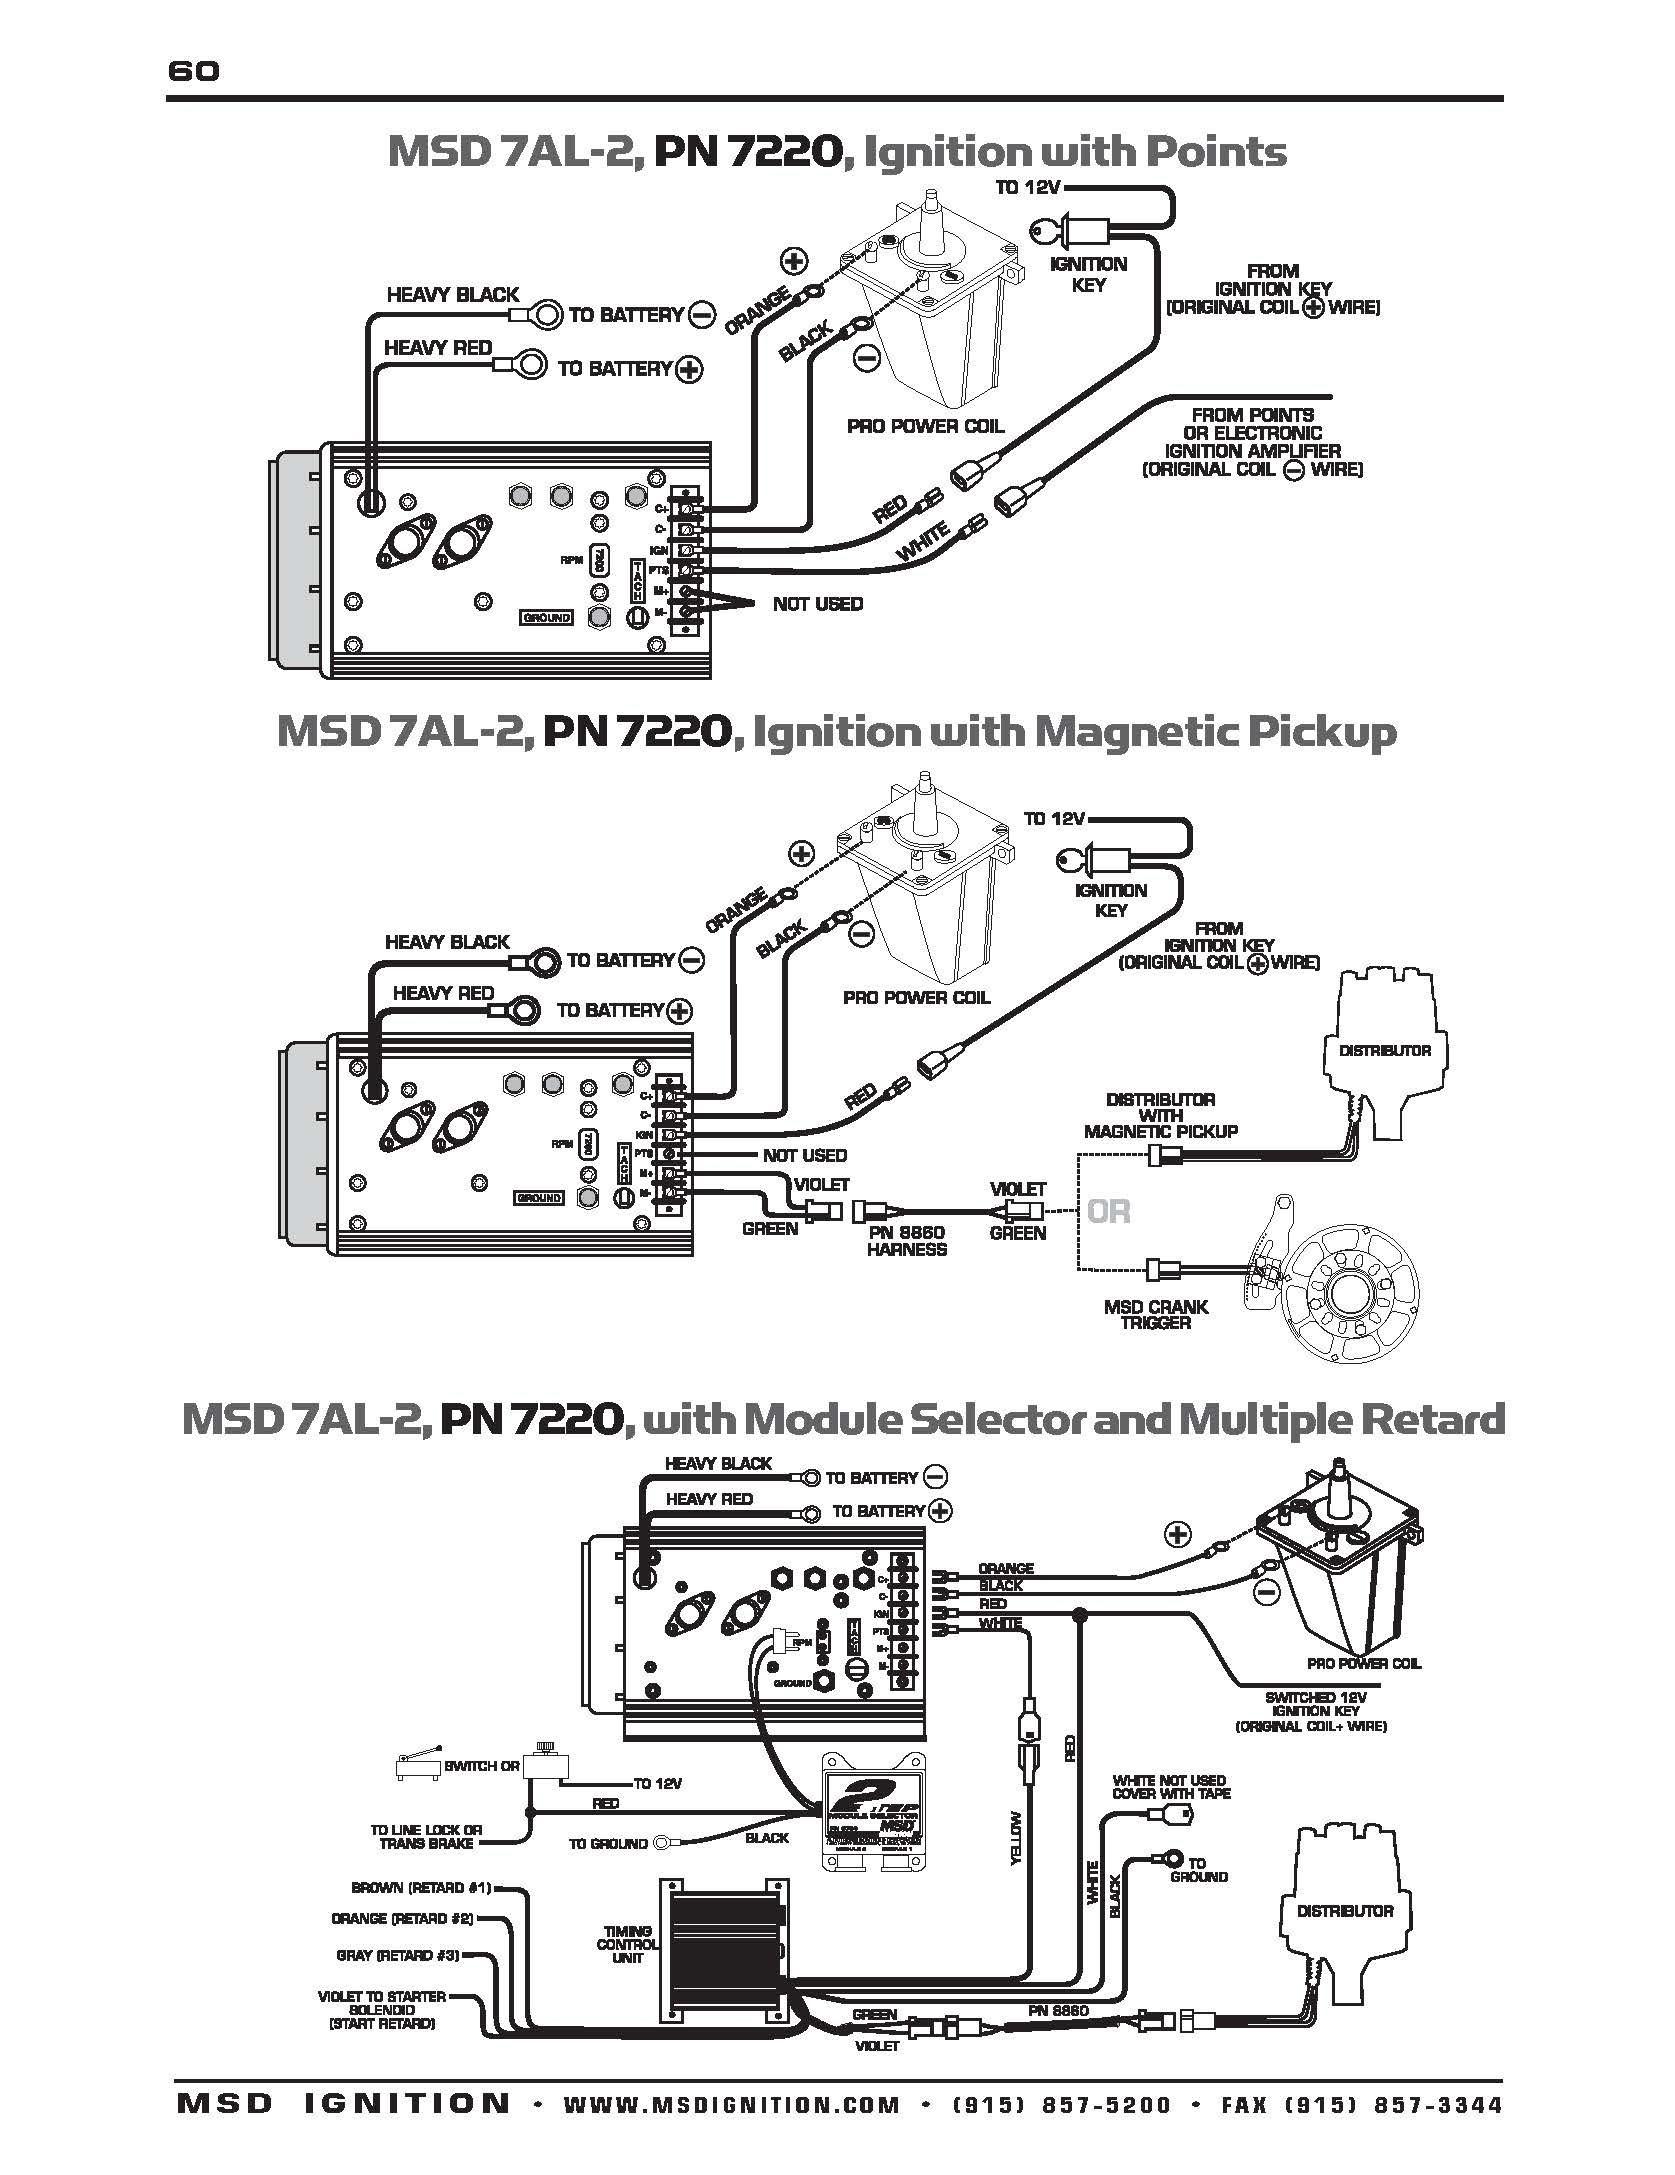 1998 Neon Msd 6al Wiring Diagram   Wiring Resources 2019 Wiring Msd Al on